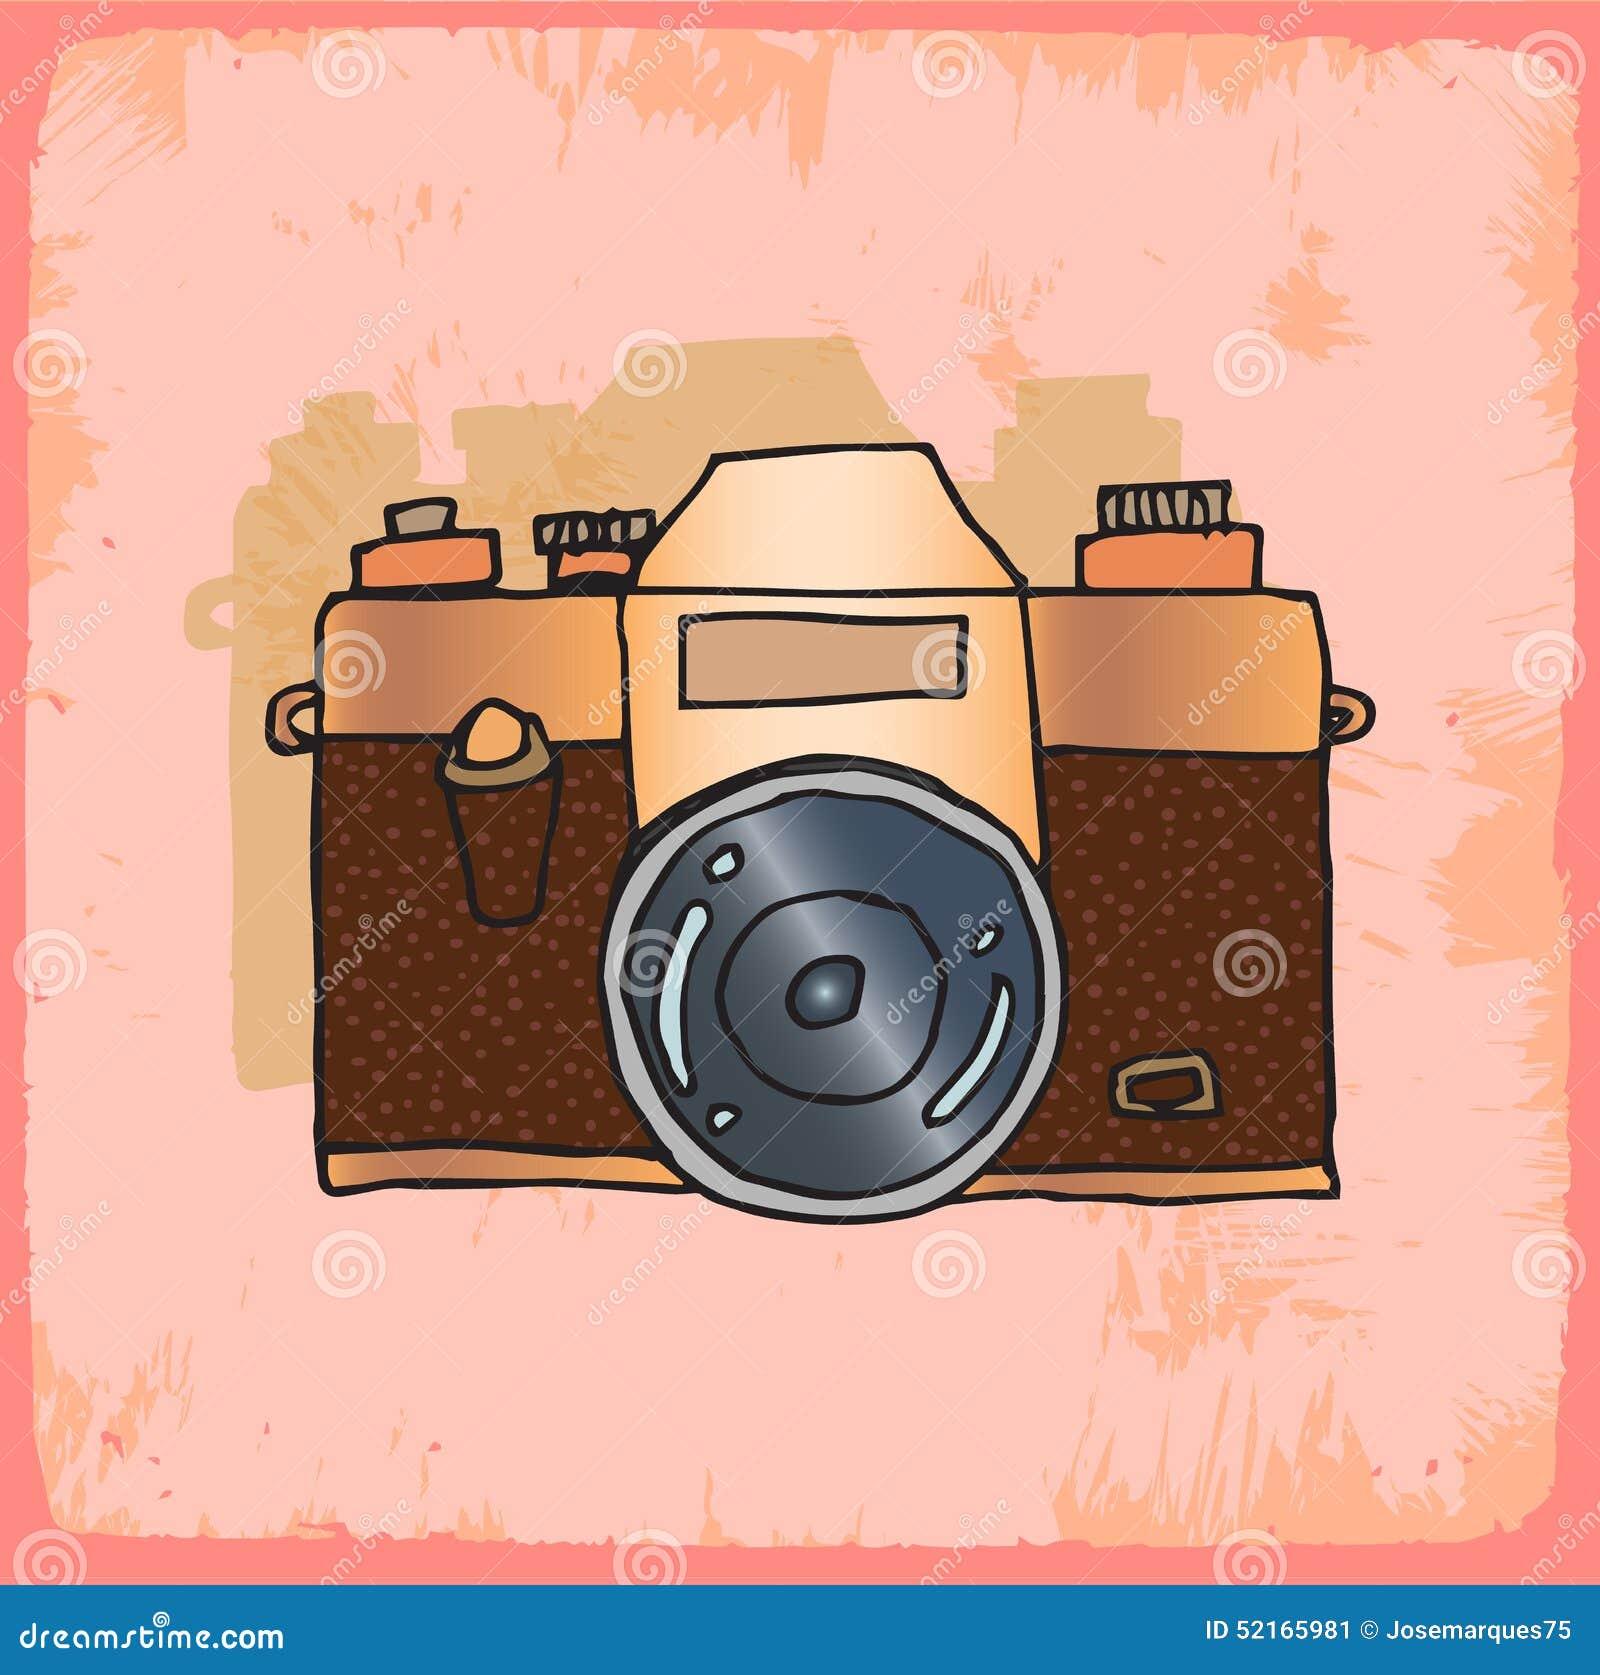 Cartoon Old Photo Camera Illustration Vector Icon Bubble Expression